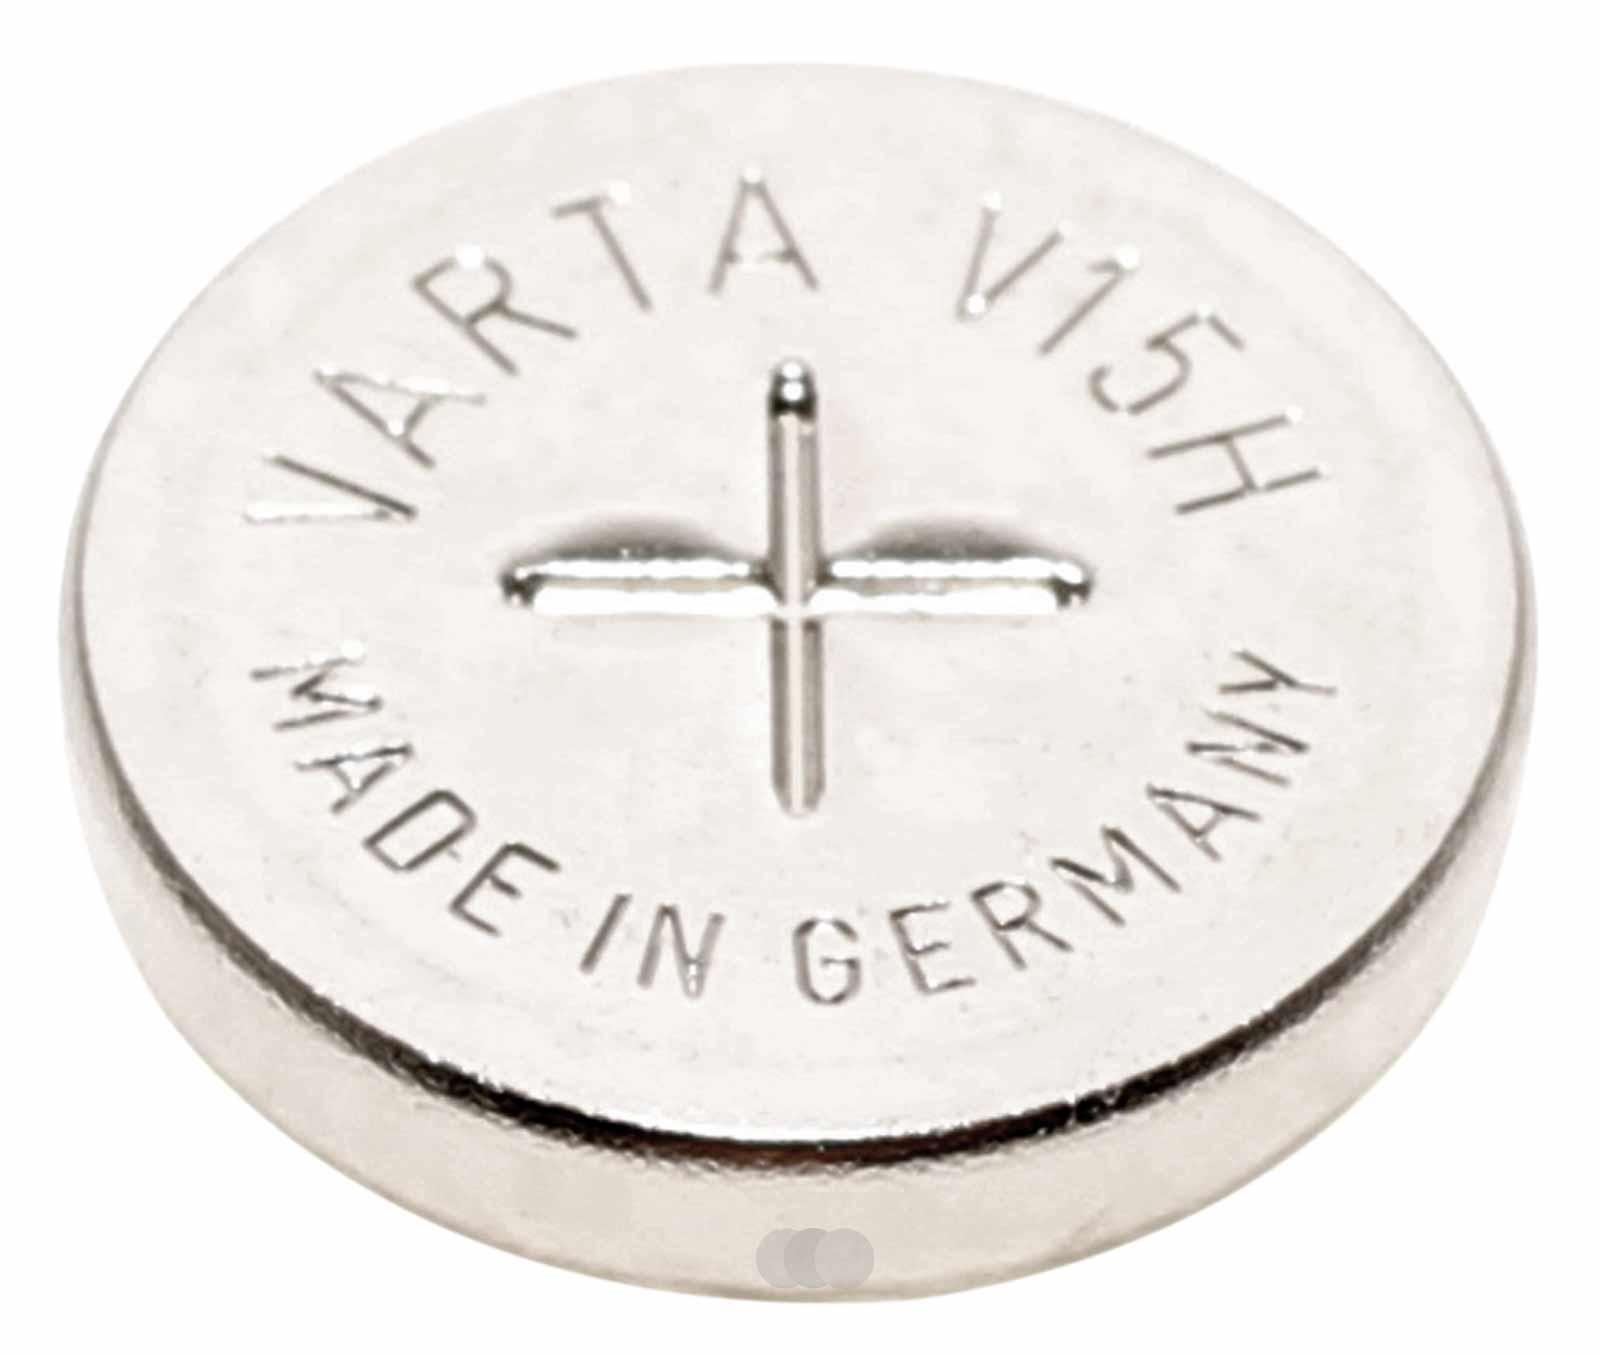 Varta V15H NiMH Akku aufladbare Knopfzelle Batterie 55602101501, 1,2V, 15mAh